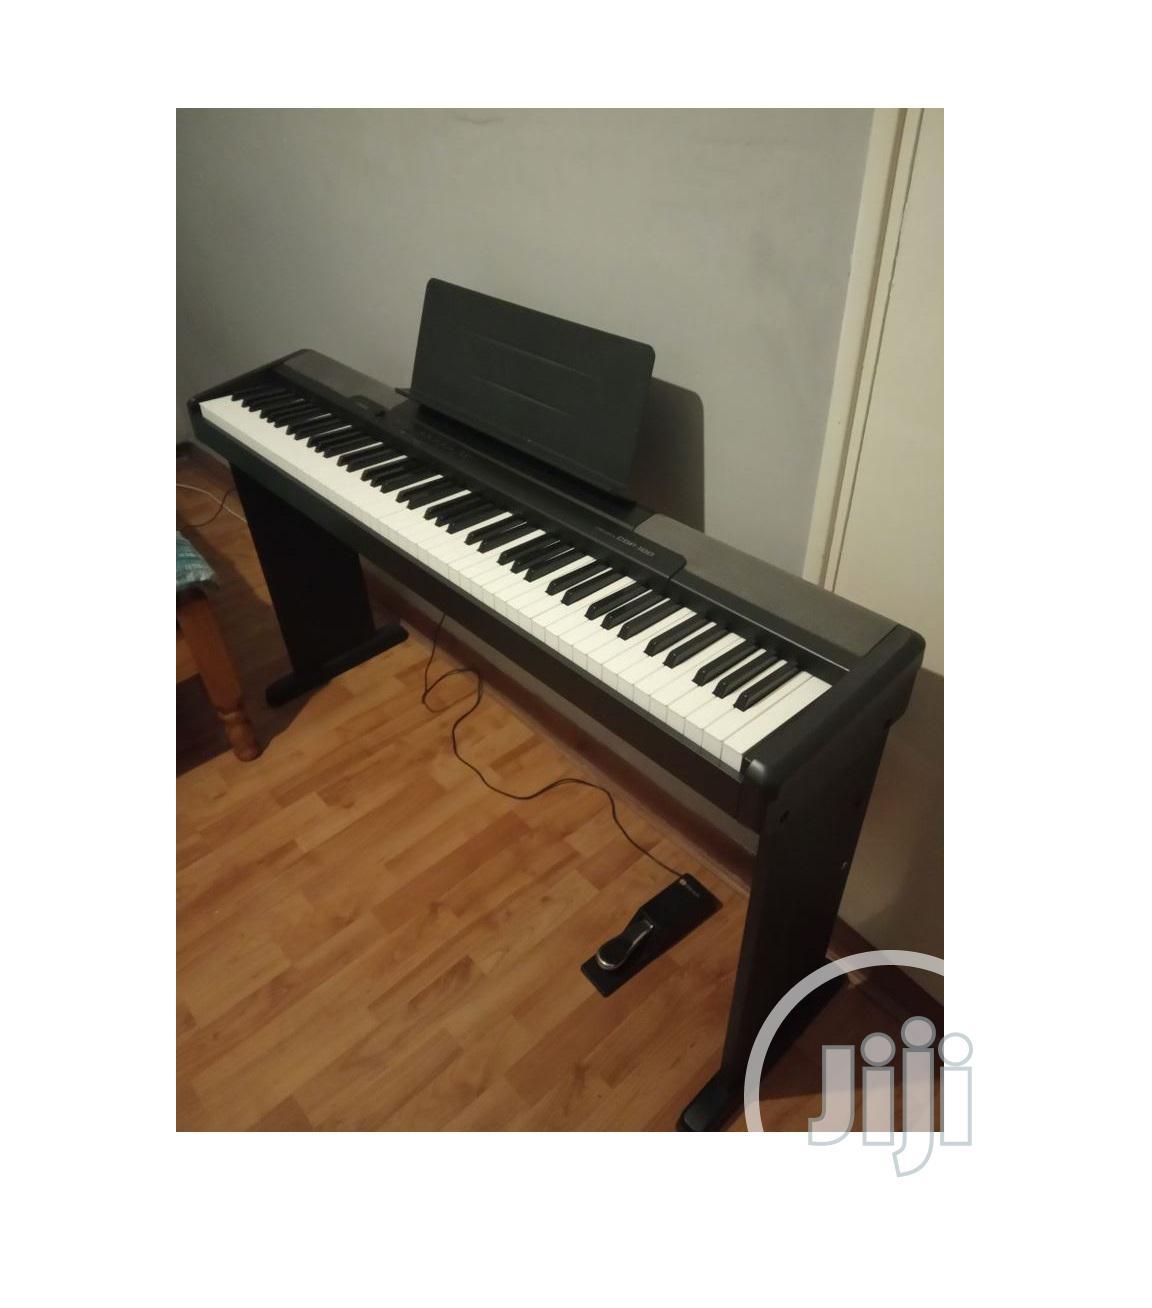 Casio Cdp 100 Digital Piano UK Used